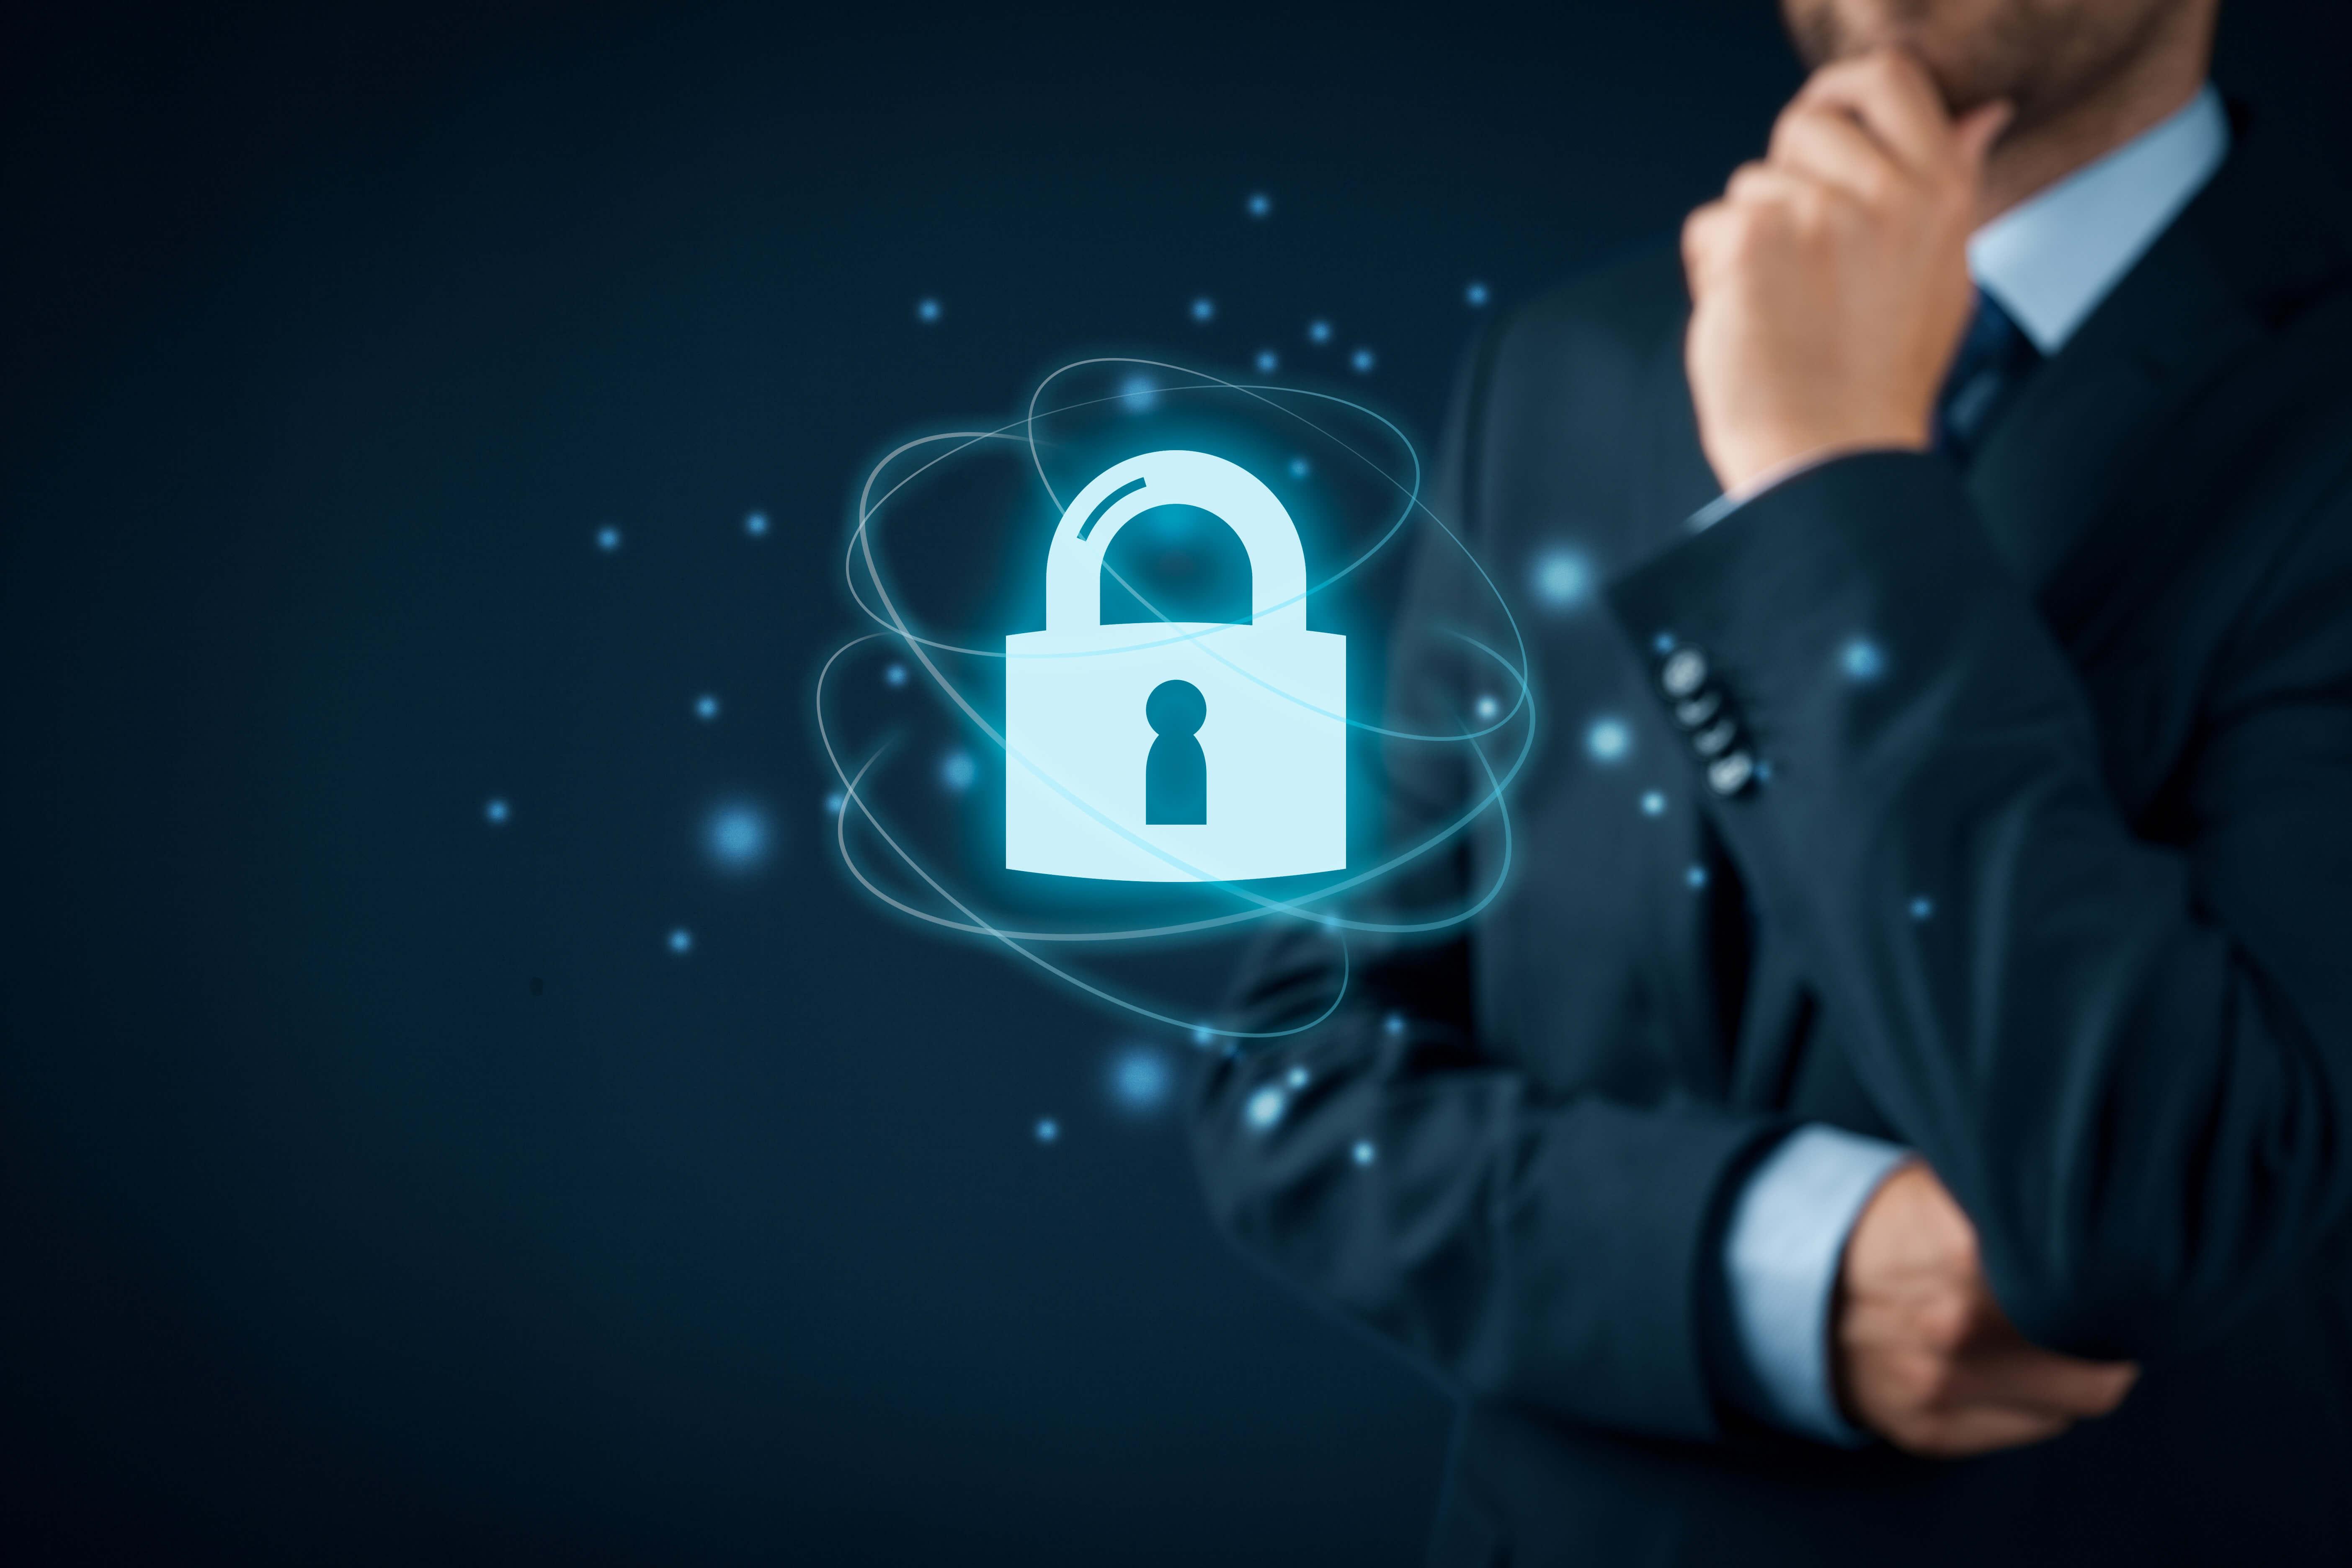 3 Cybersecurity Start-up Ideas